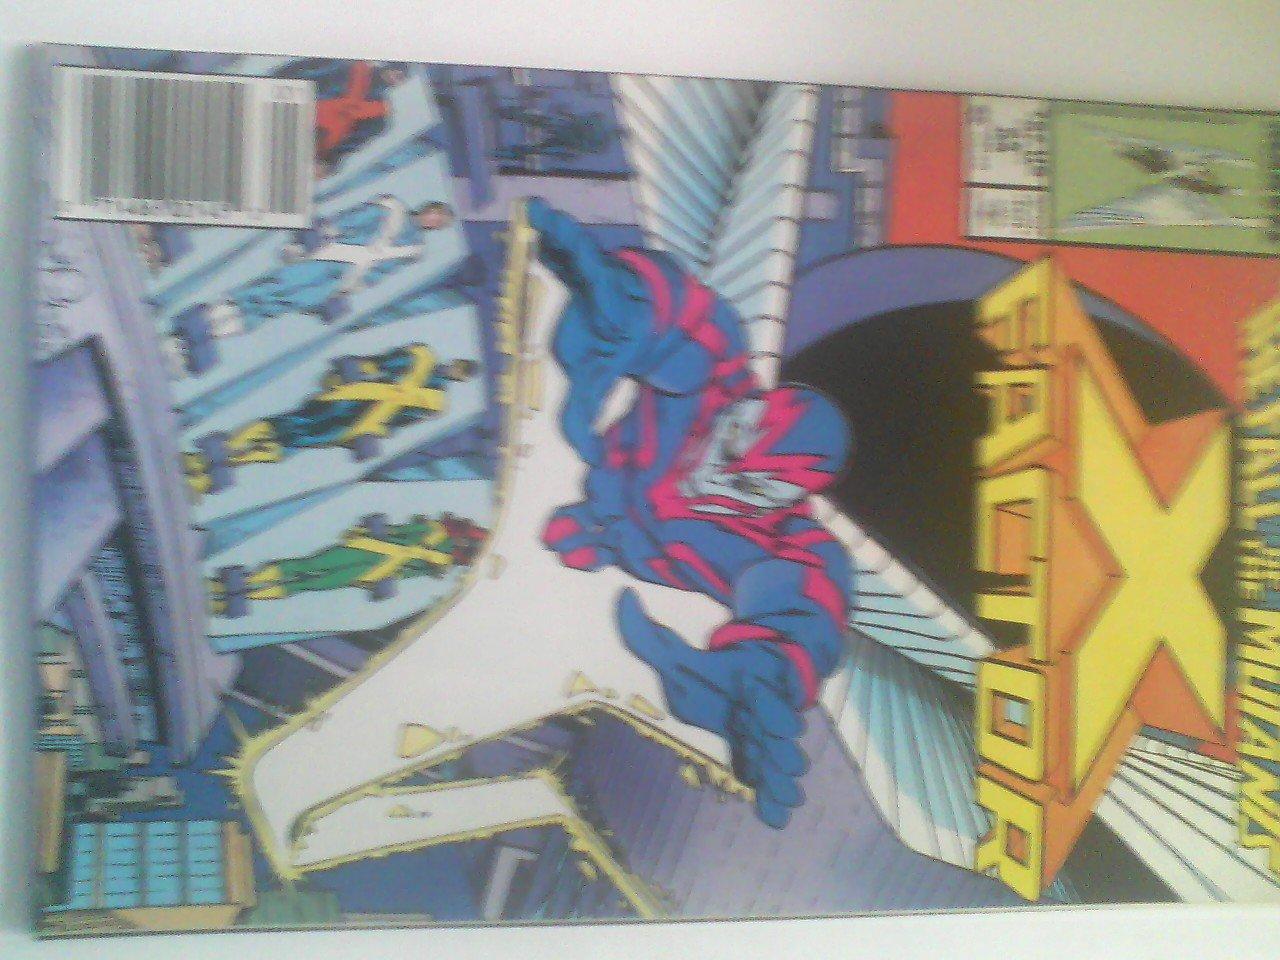 x-factor #24 1st archangel ,x-factor#49, X-factor 50